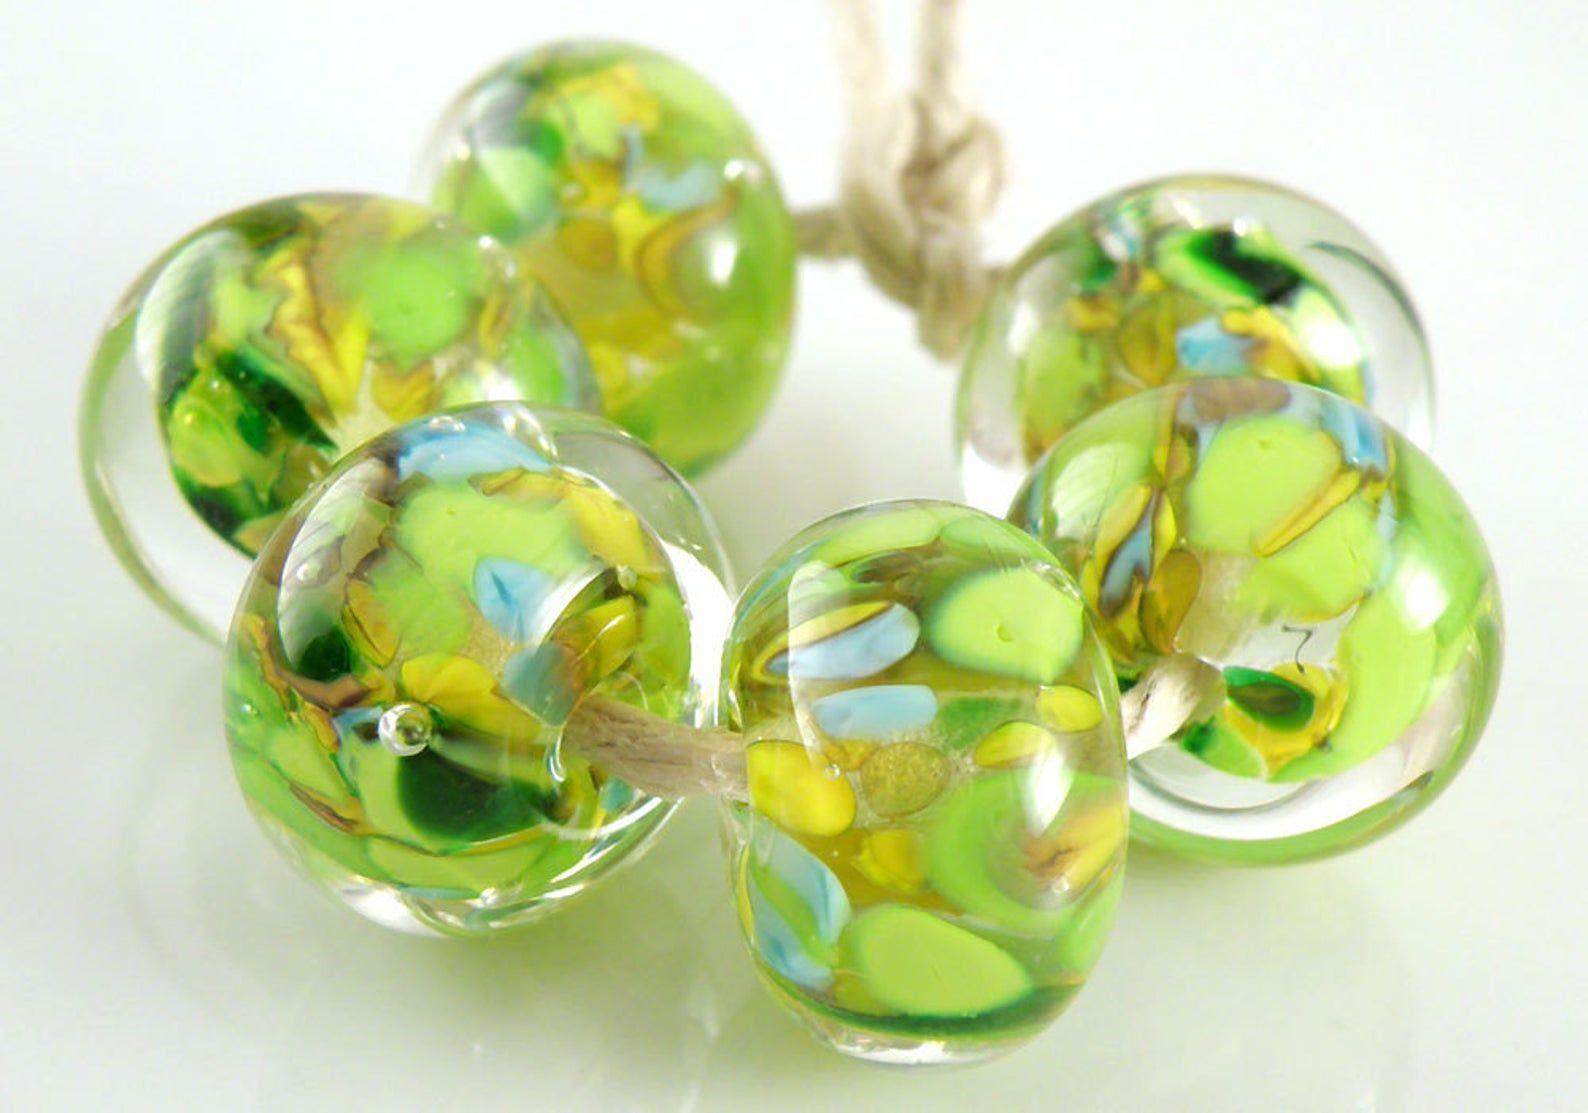 Lampwork Glass Beads jewelry supplies jewelry supplies Gold and black crystal lampwork beads sra artisan beads set of 6